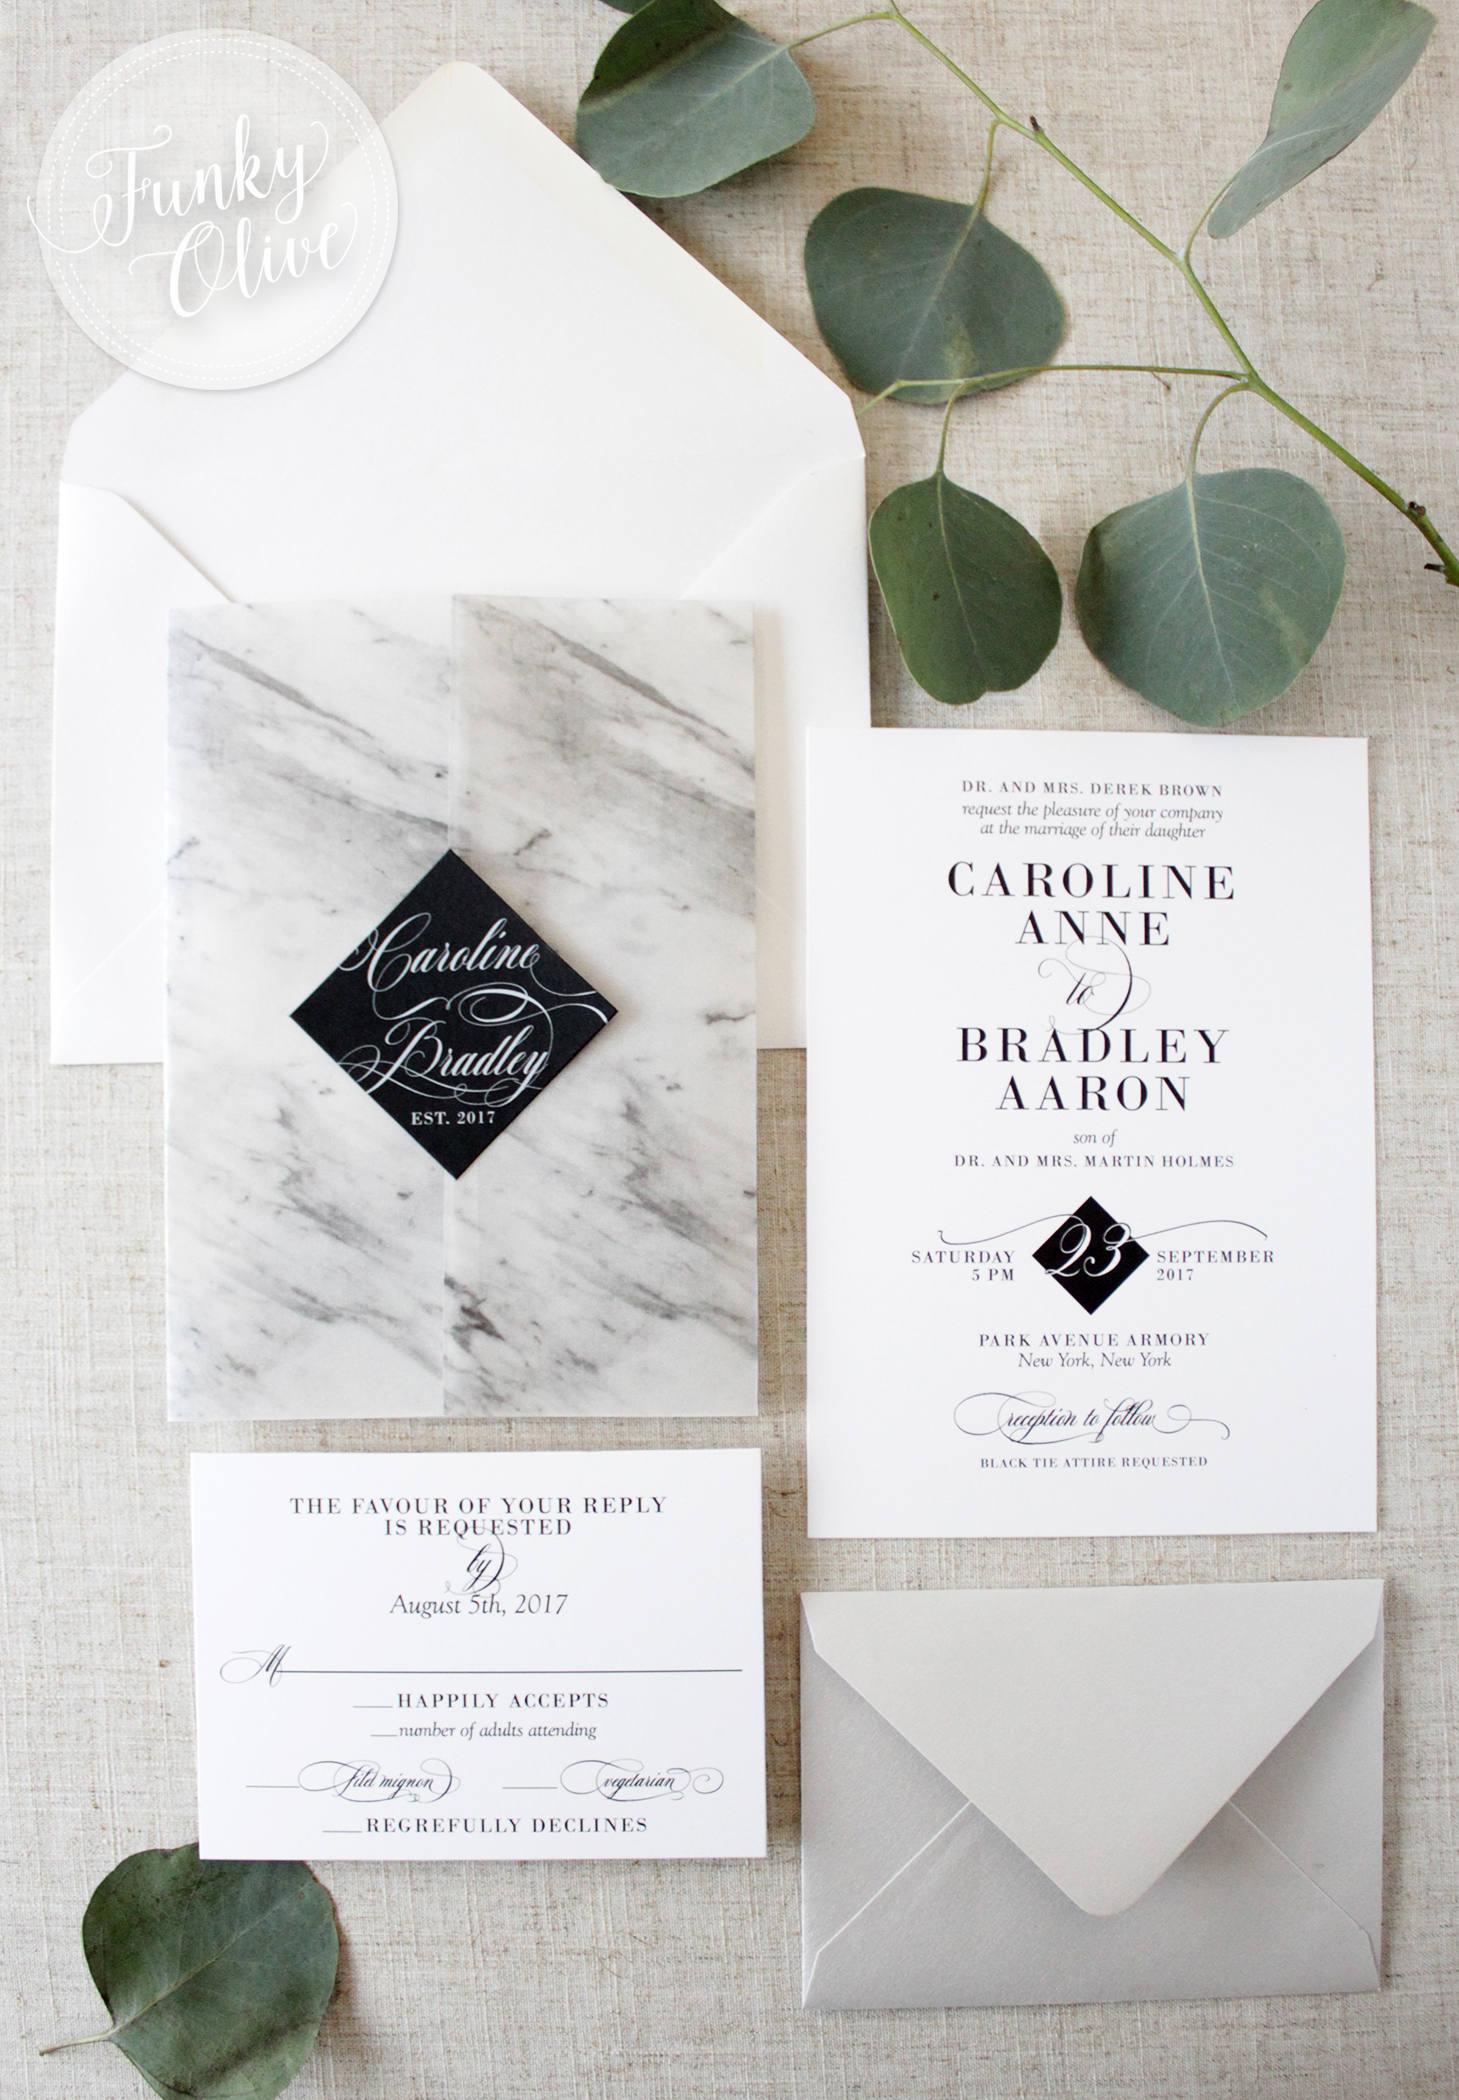 Marble Vellum Wrap Wedding Invitation Package Black Tie Wedding ...